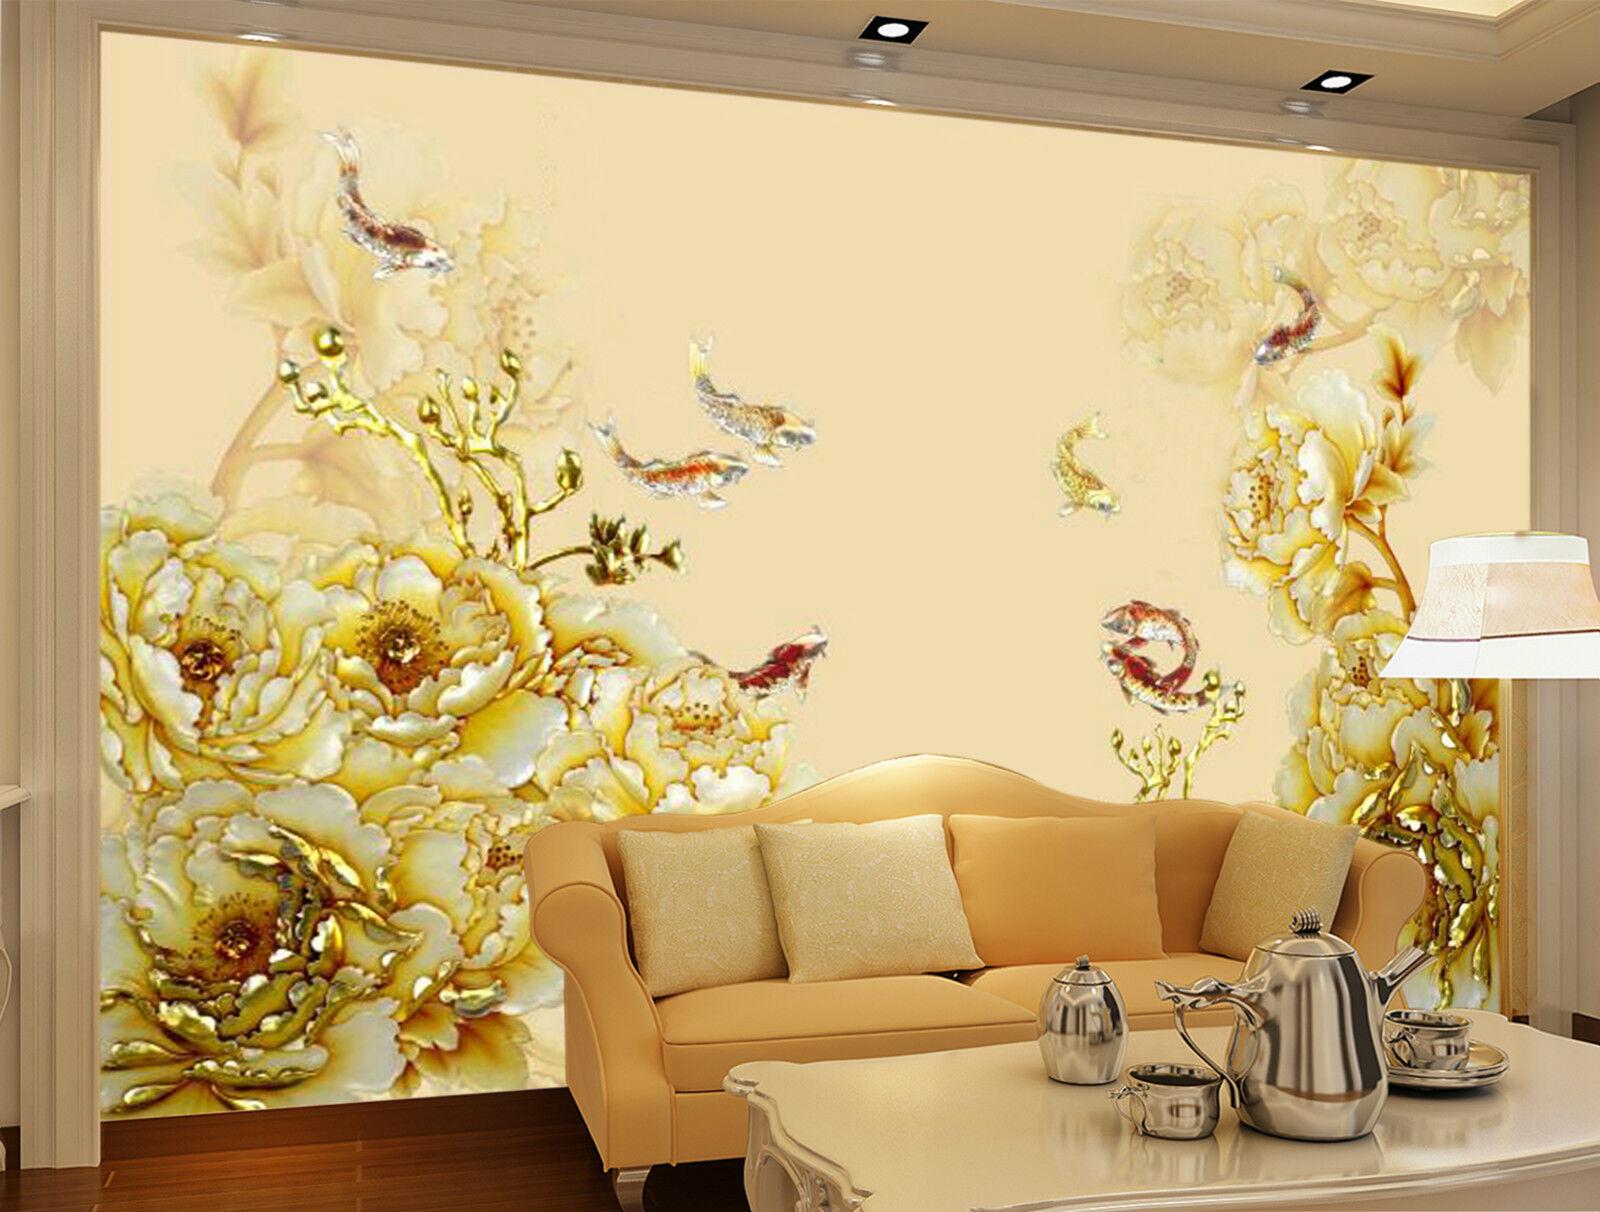 3D Kultur 1743 Fototapeten Wandbild Fototapete Bild Tapete Familie Kinder DE